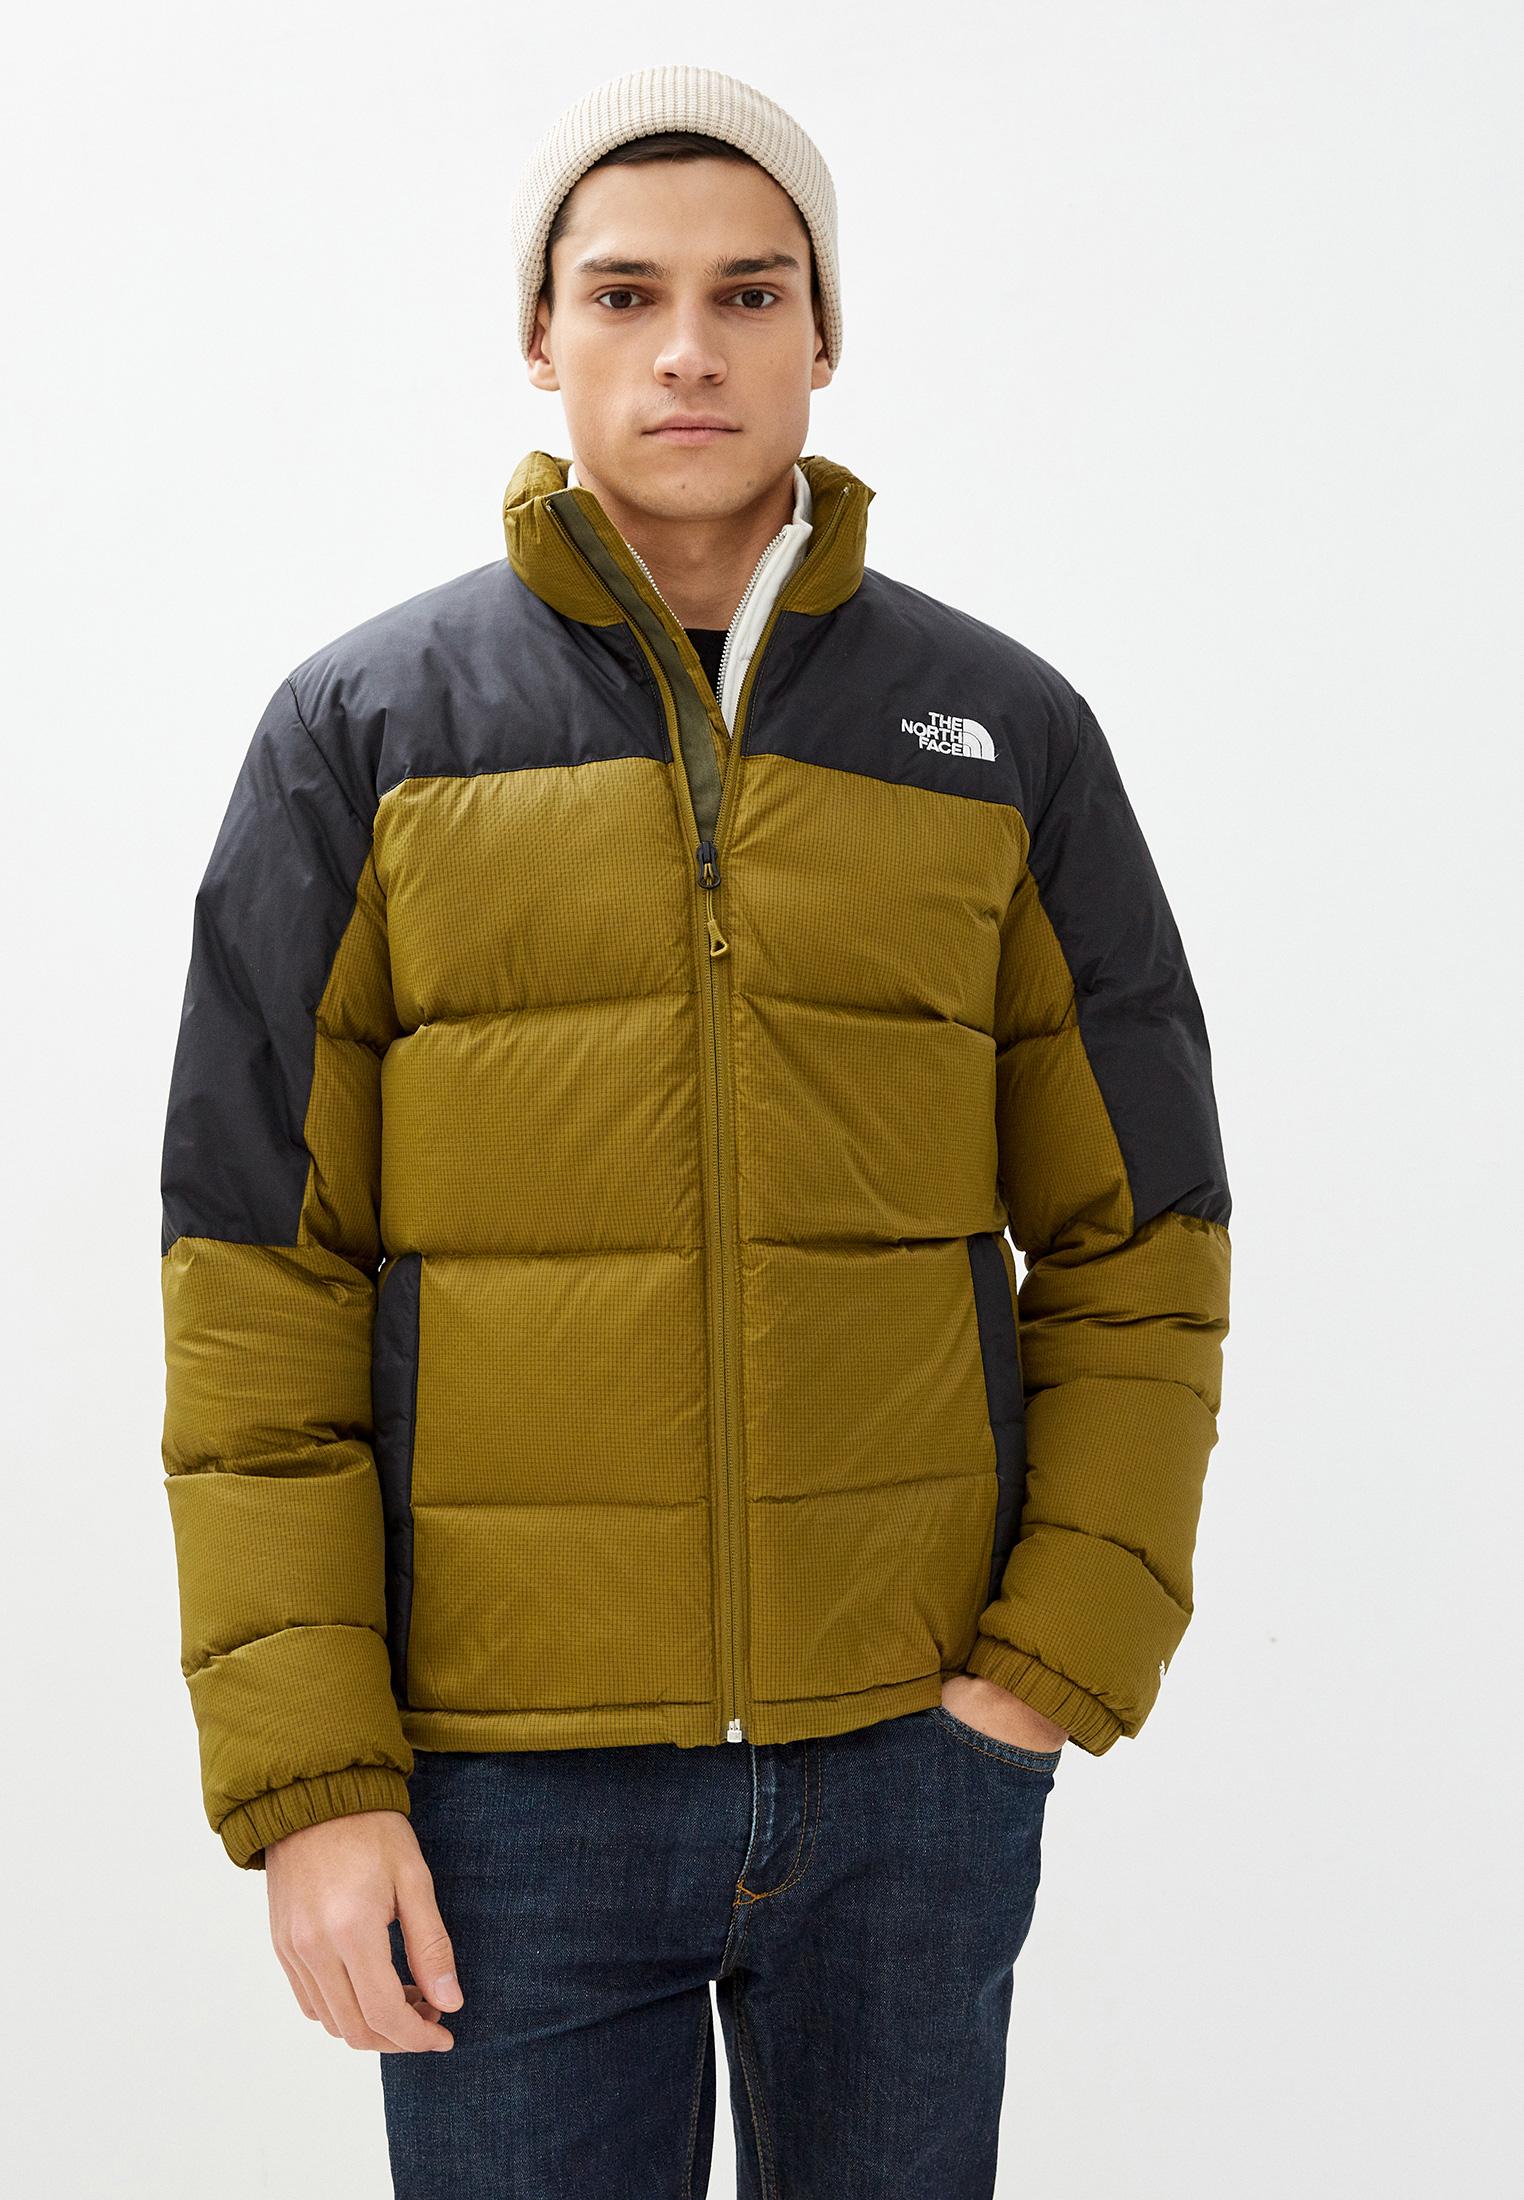 Мужская верхняя одежда The North Face (Зе Норт Фейс) TA4M9J